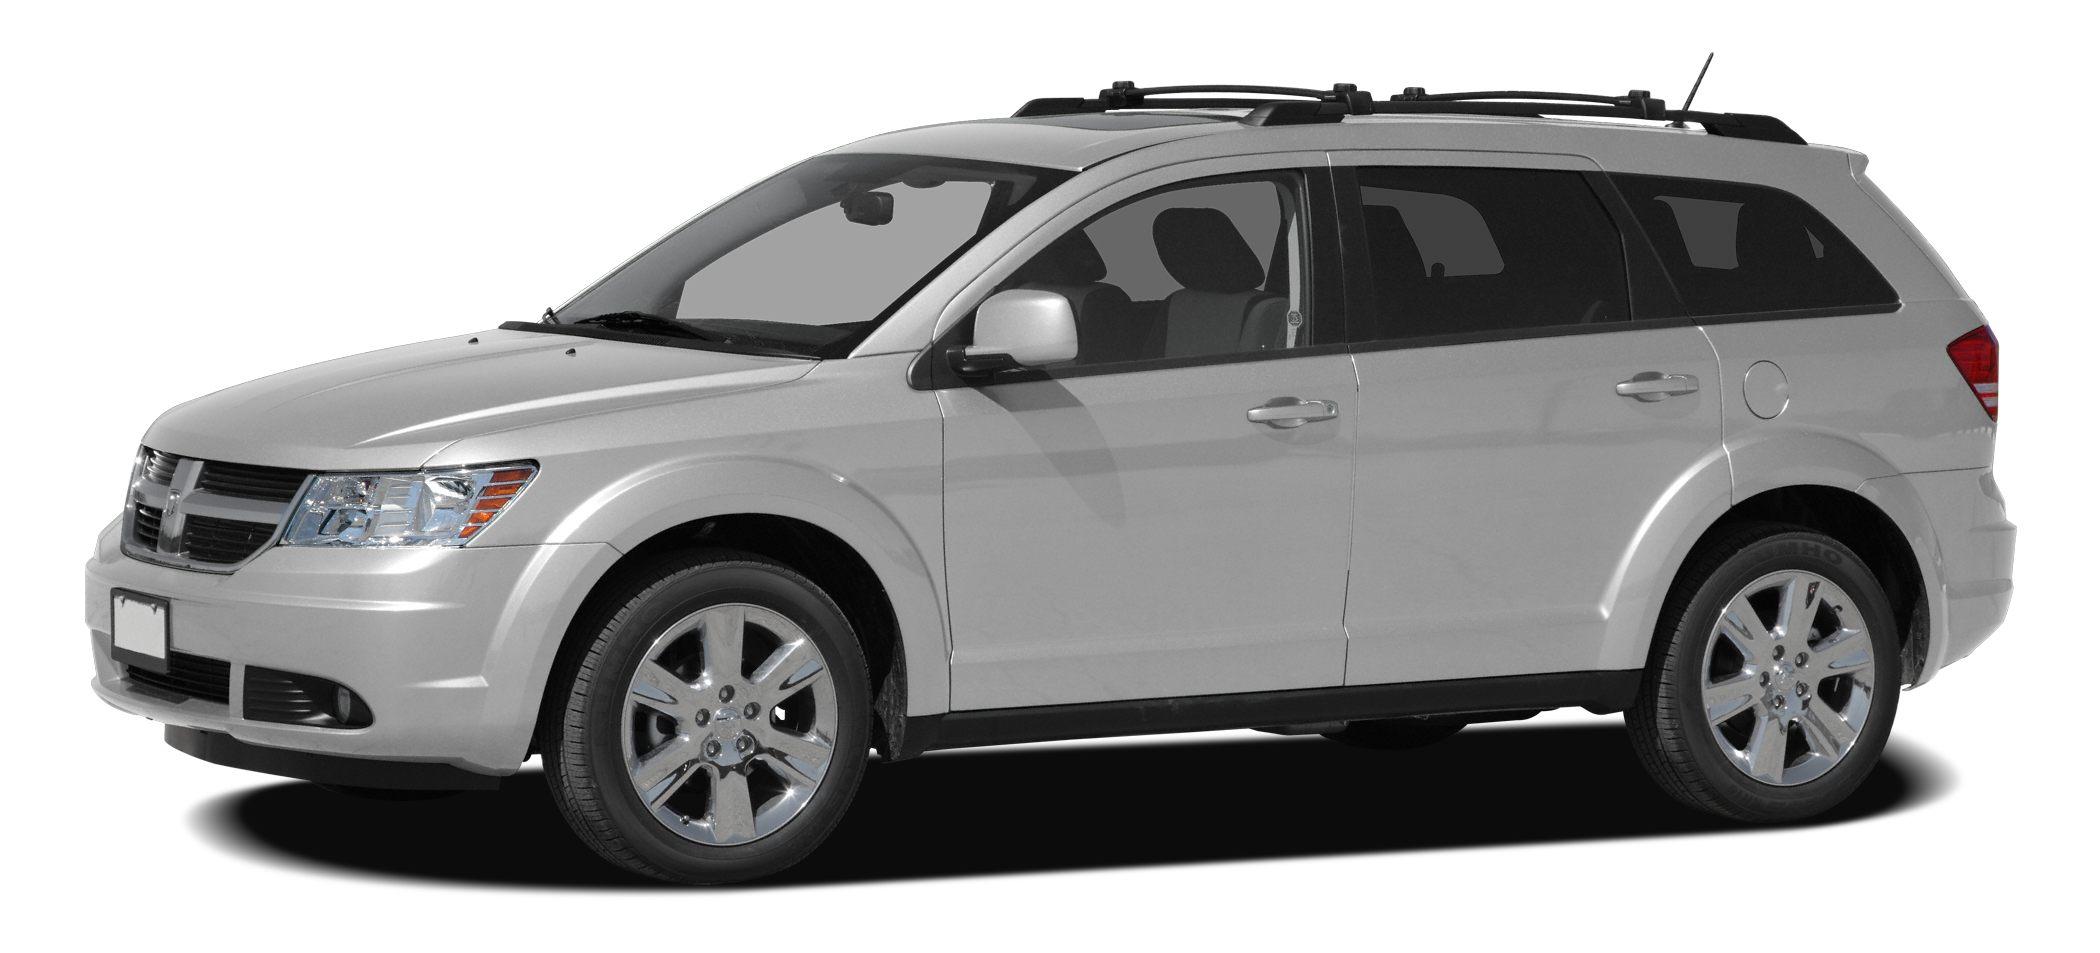 2010 Dodge Journey SXT AWD SXT Bright Silver Metallic on Dark Slate Gray interiorVery well equ